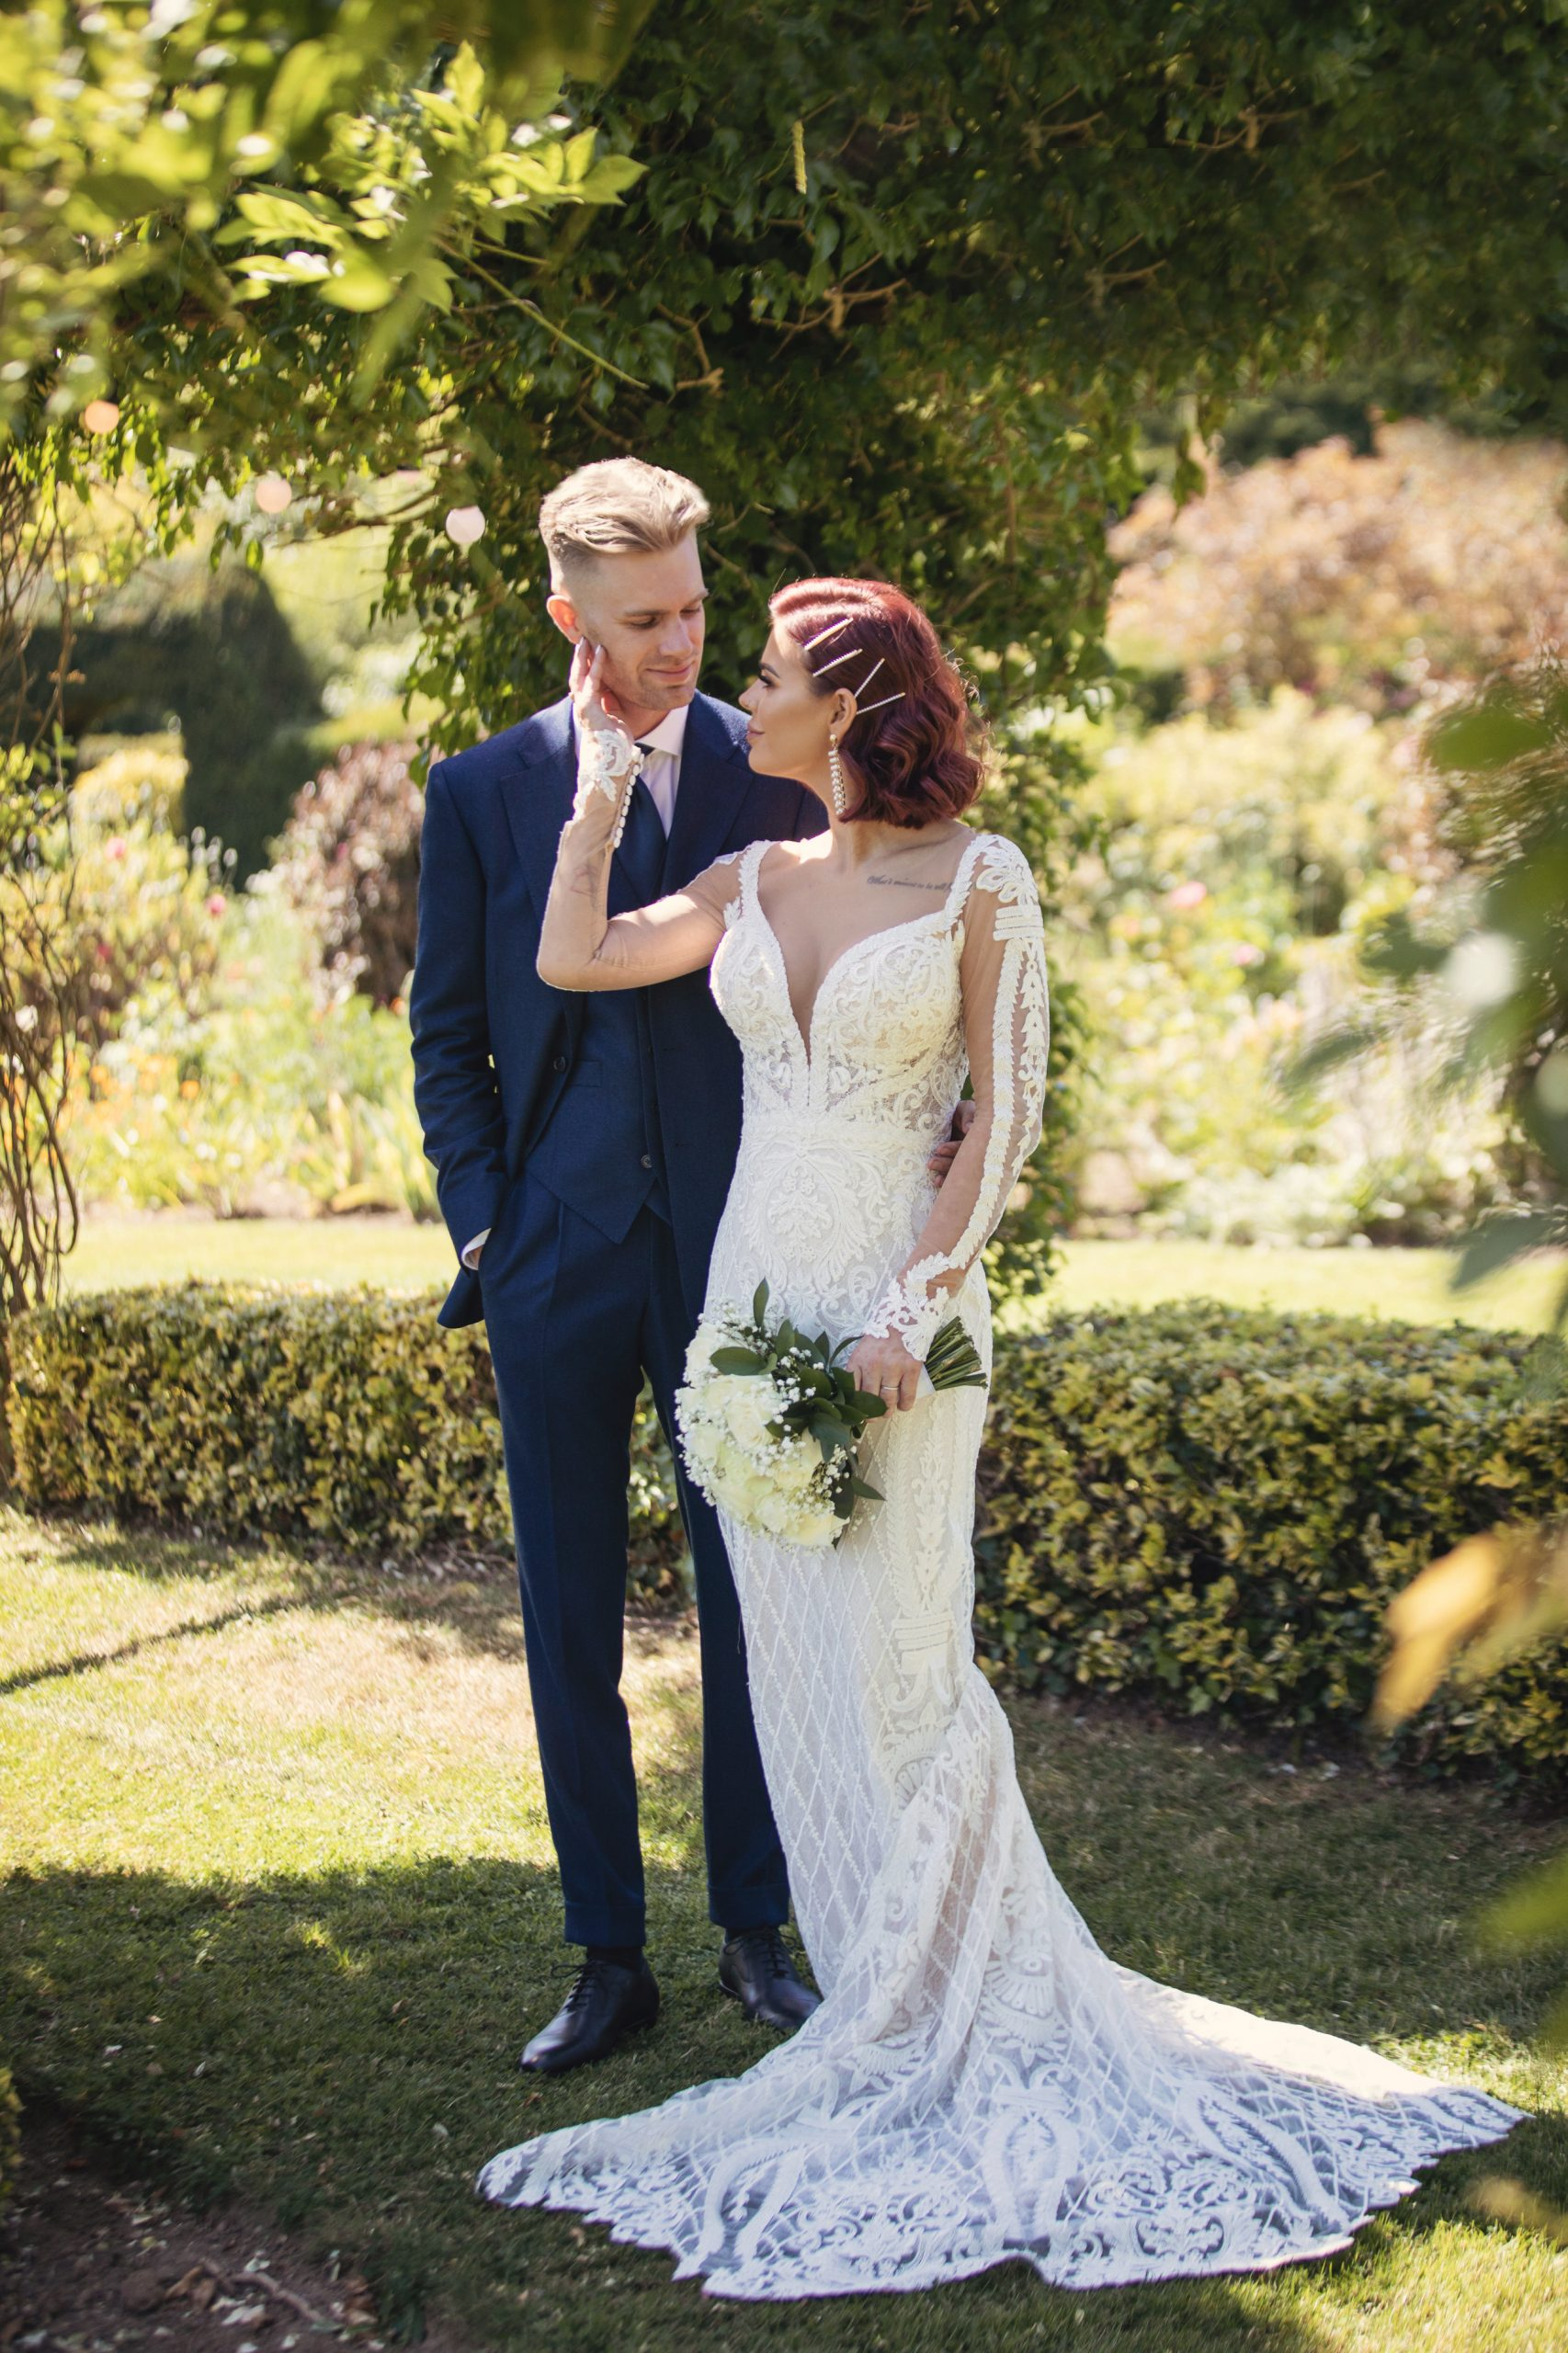 gardens-yalding-kent-wedding-venue